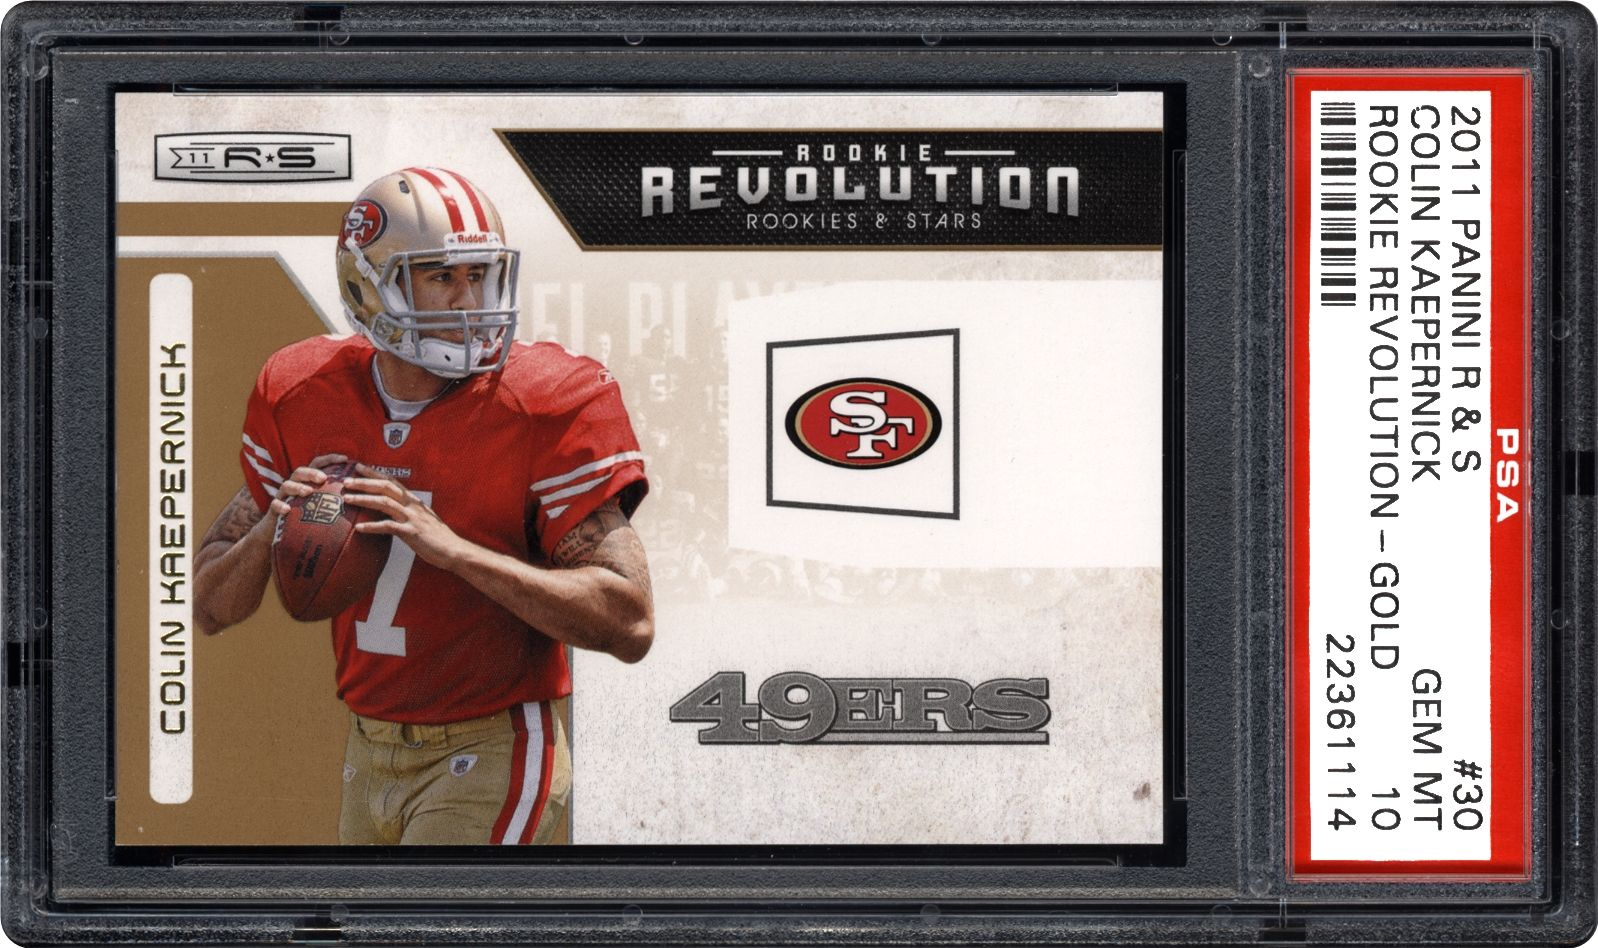 Football Cards 2011 Rookies And Stars Rookie Revolution